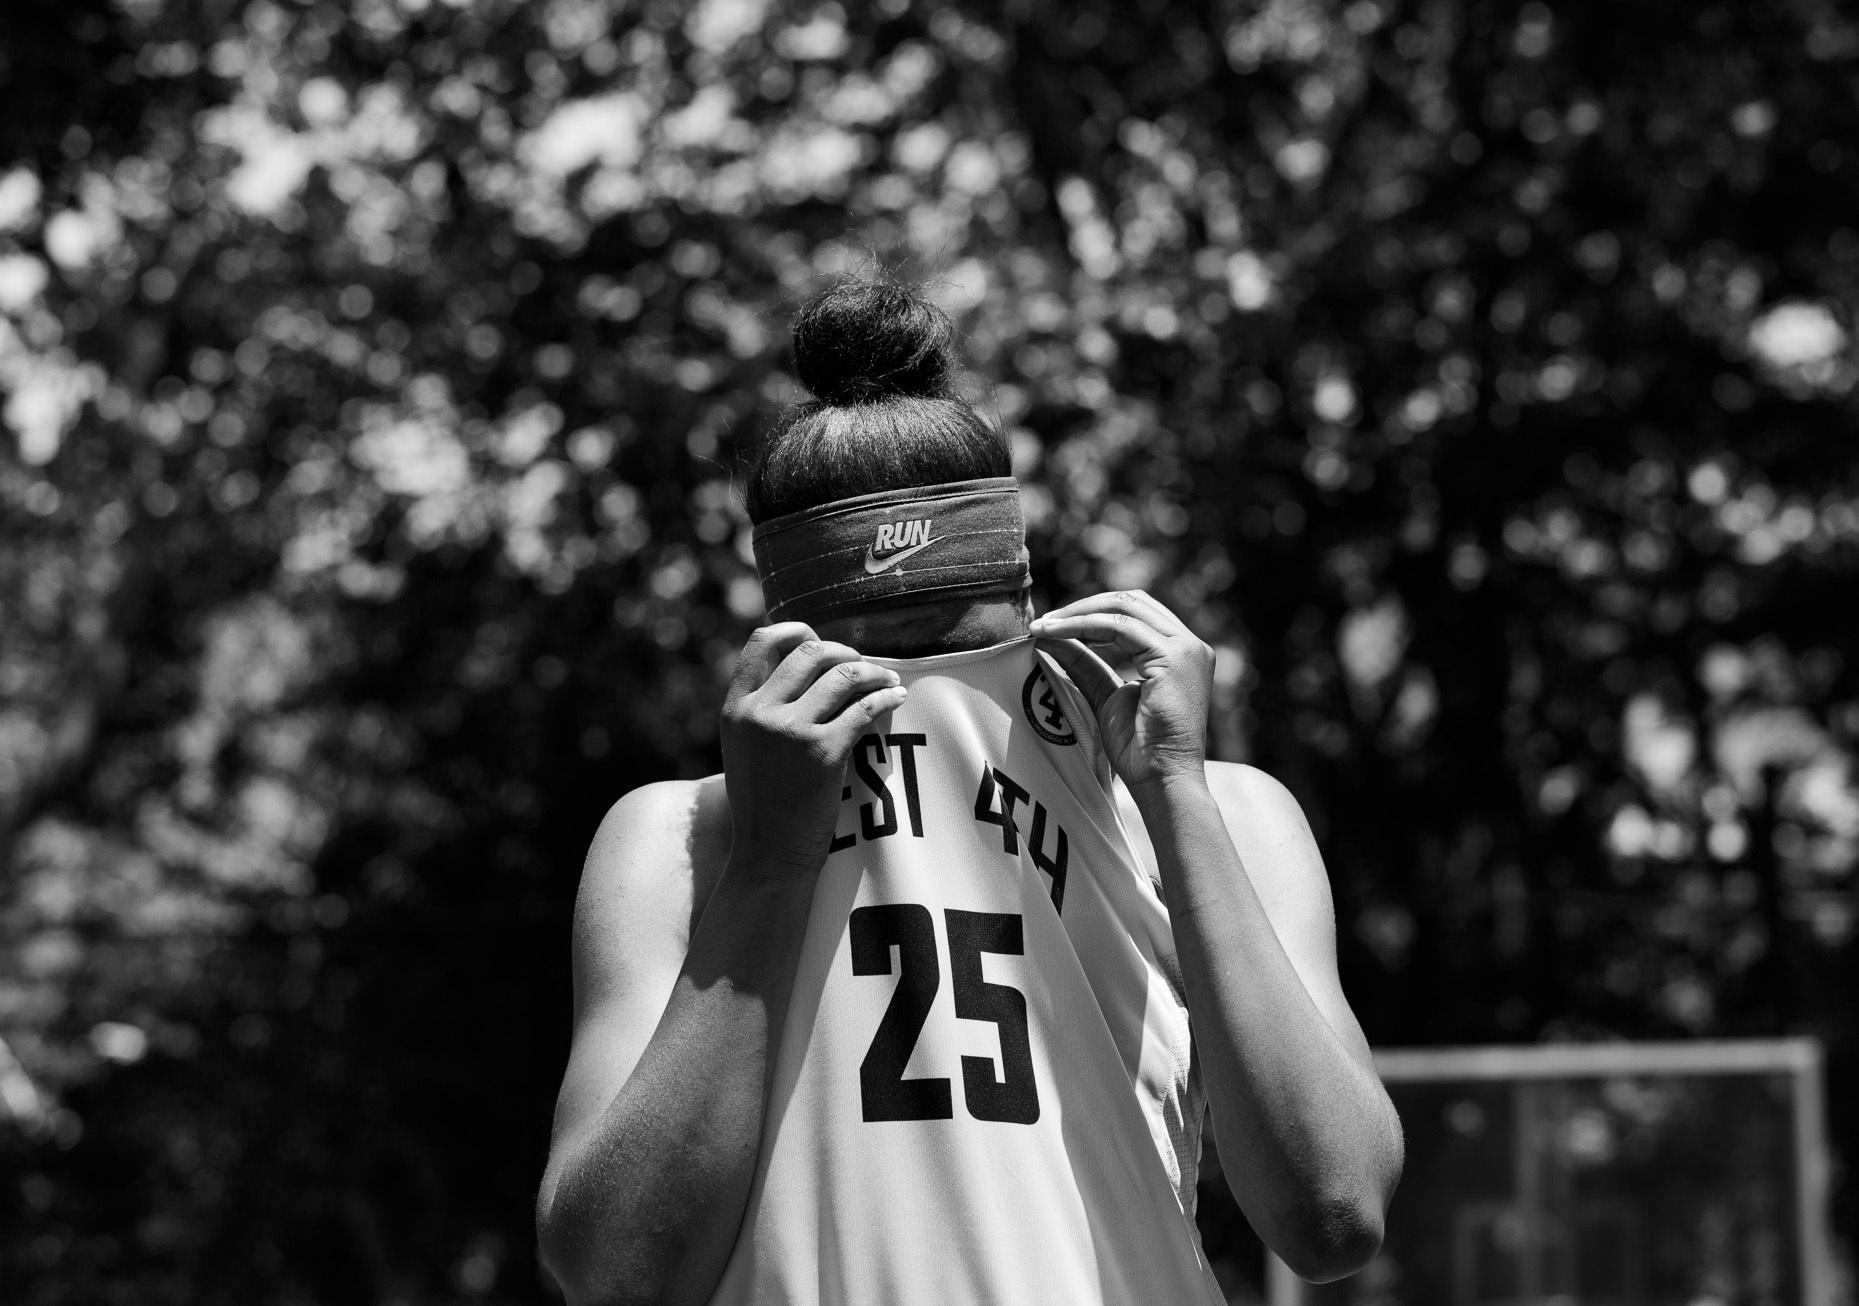 Sport 41